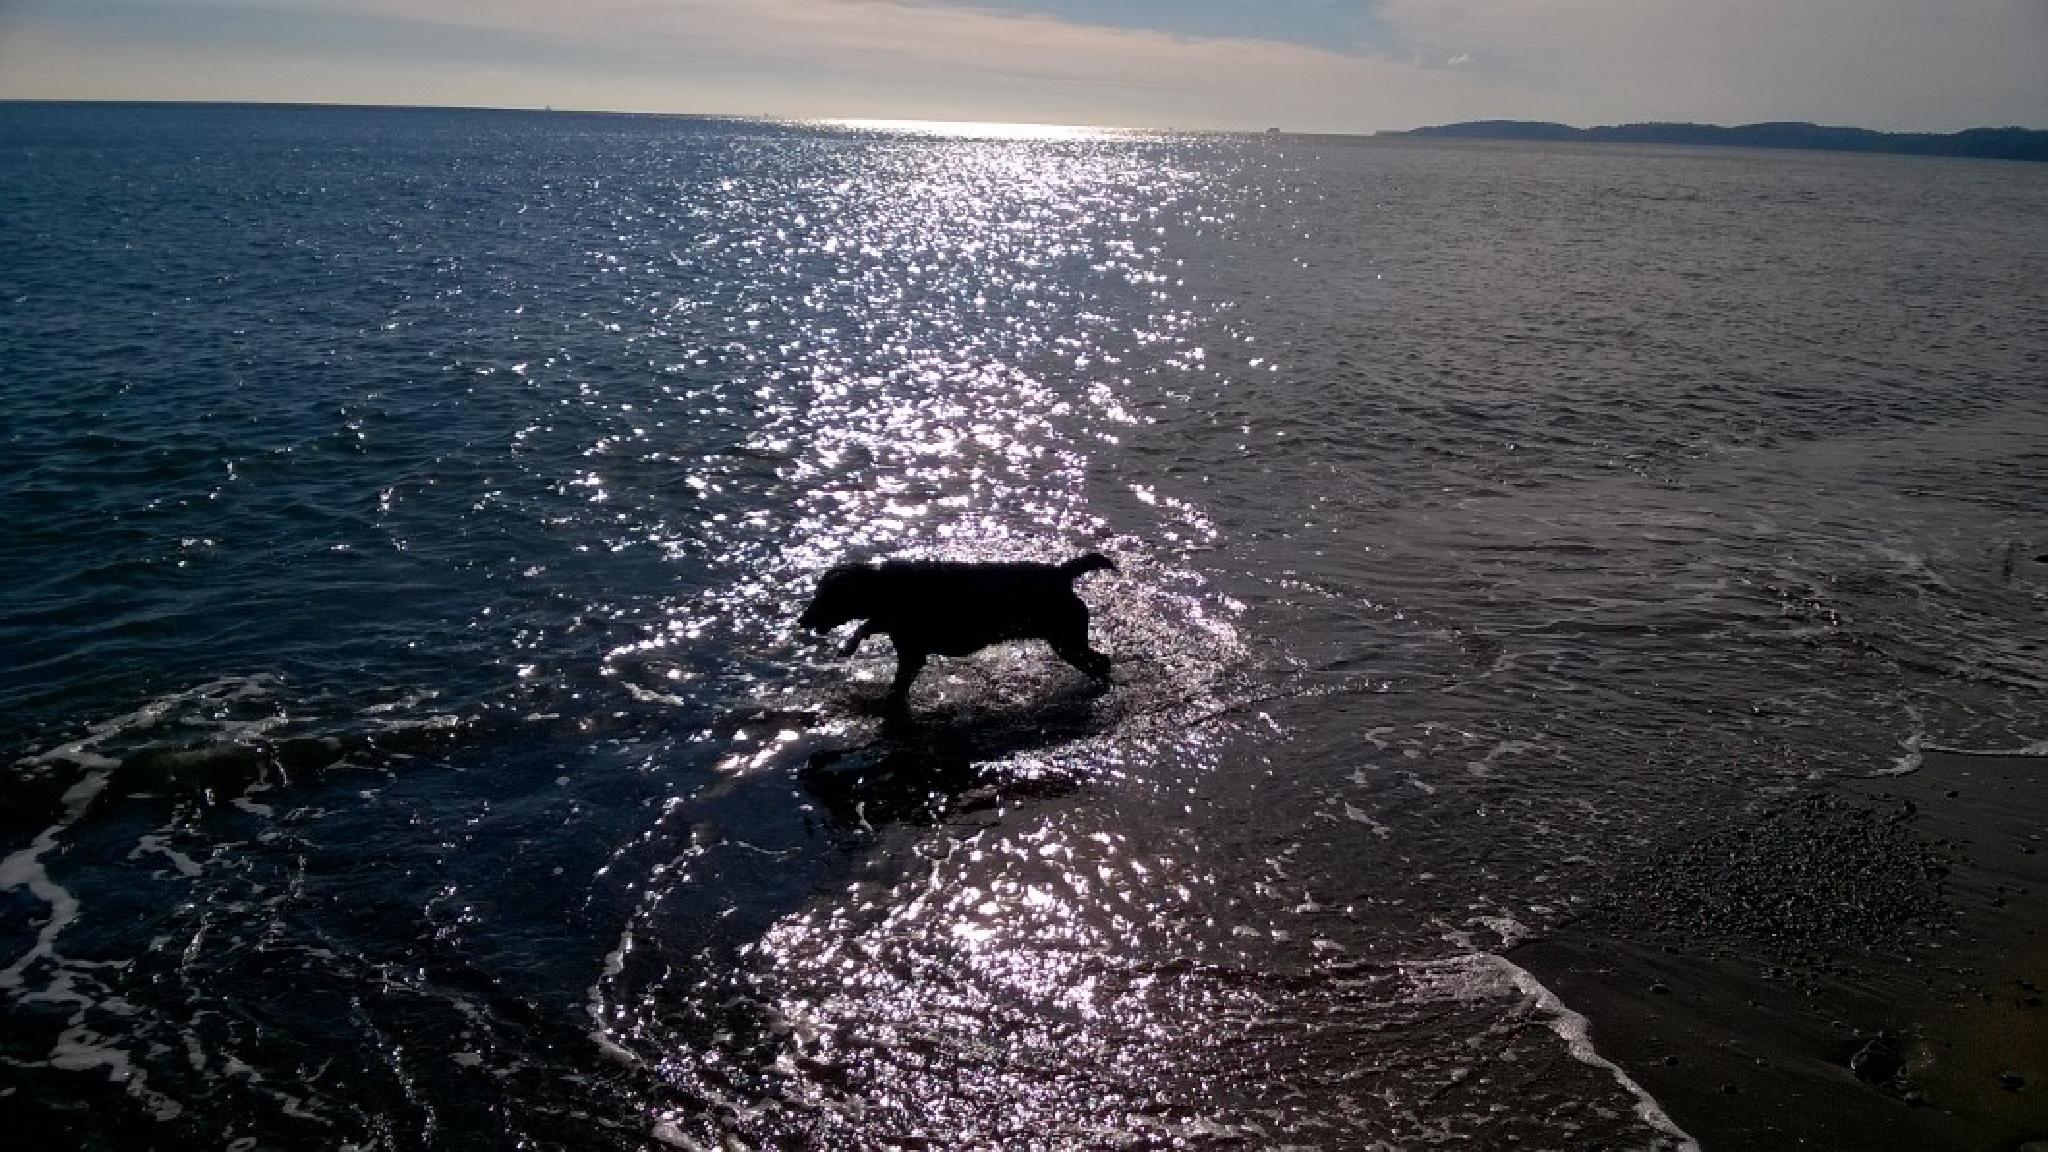 Layla on the beach by sanjay